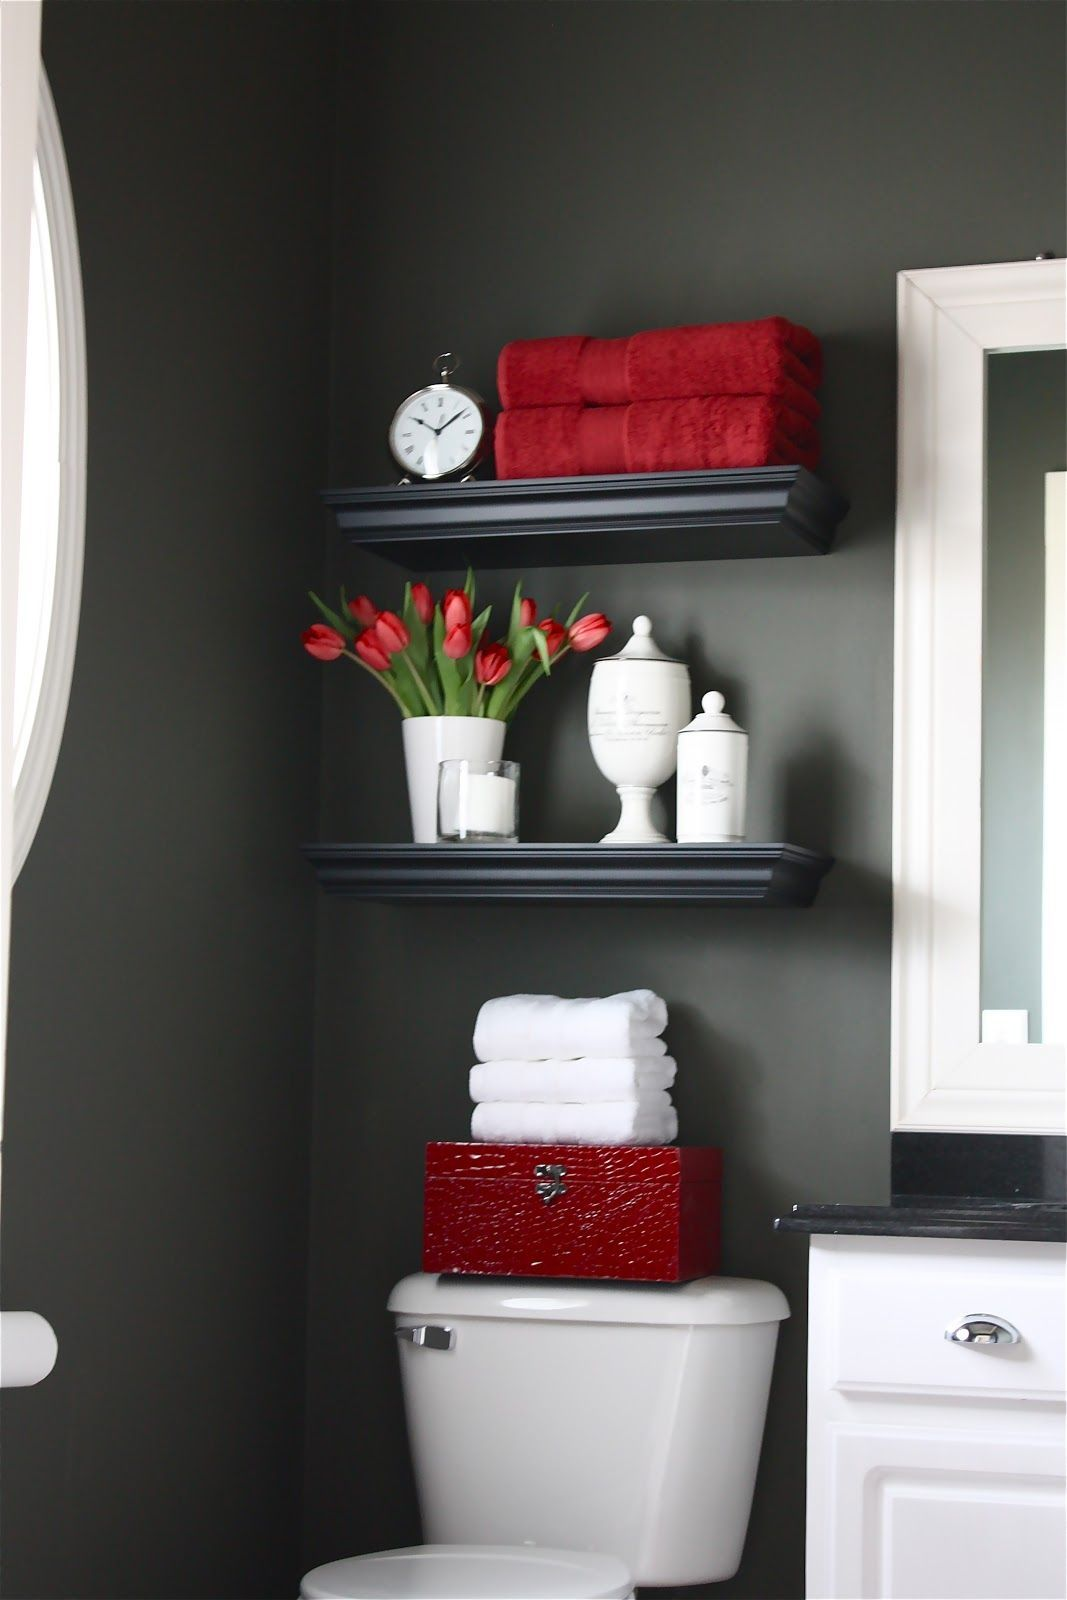 main floor bathroom - light gray walls, red and dark brown accents